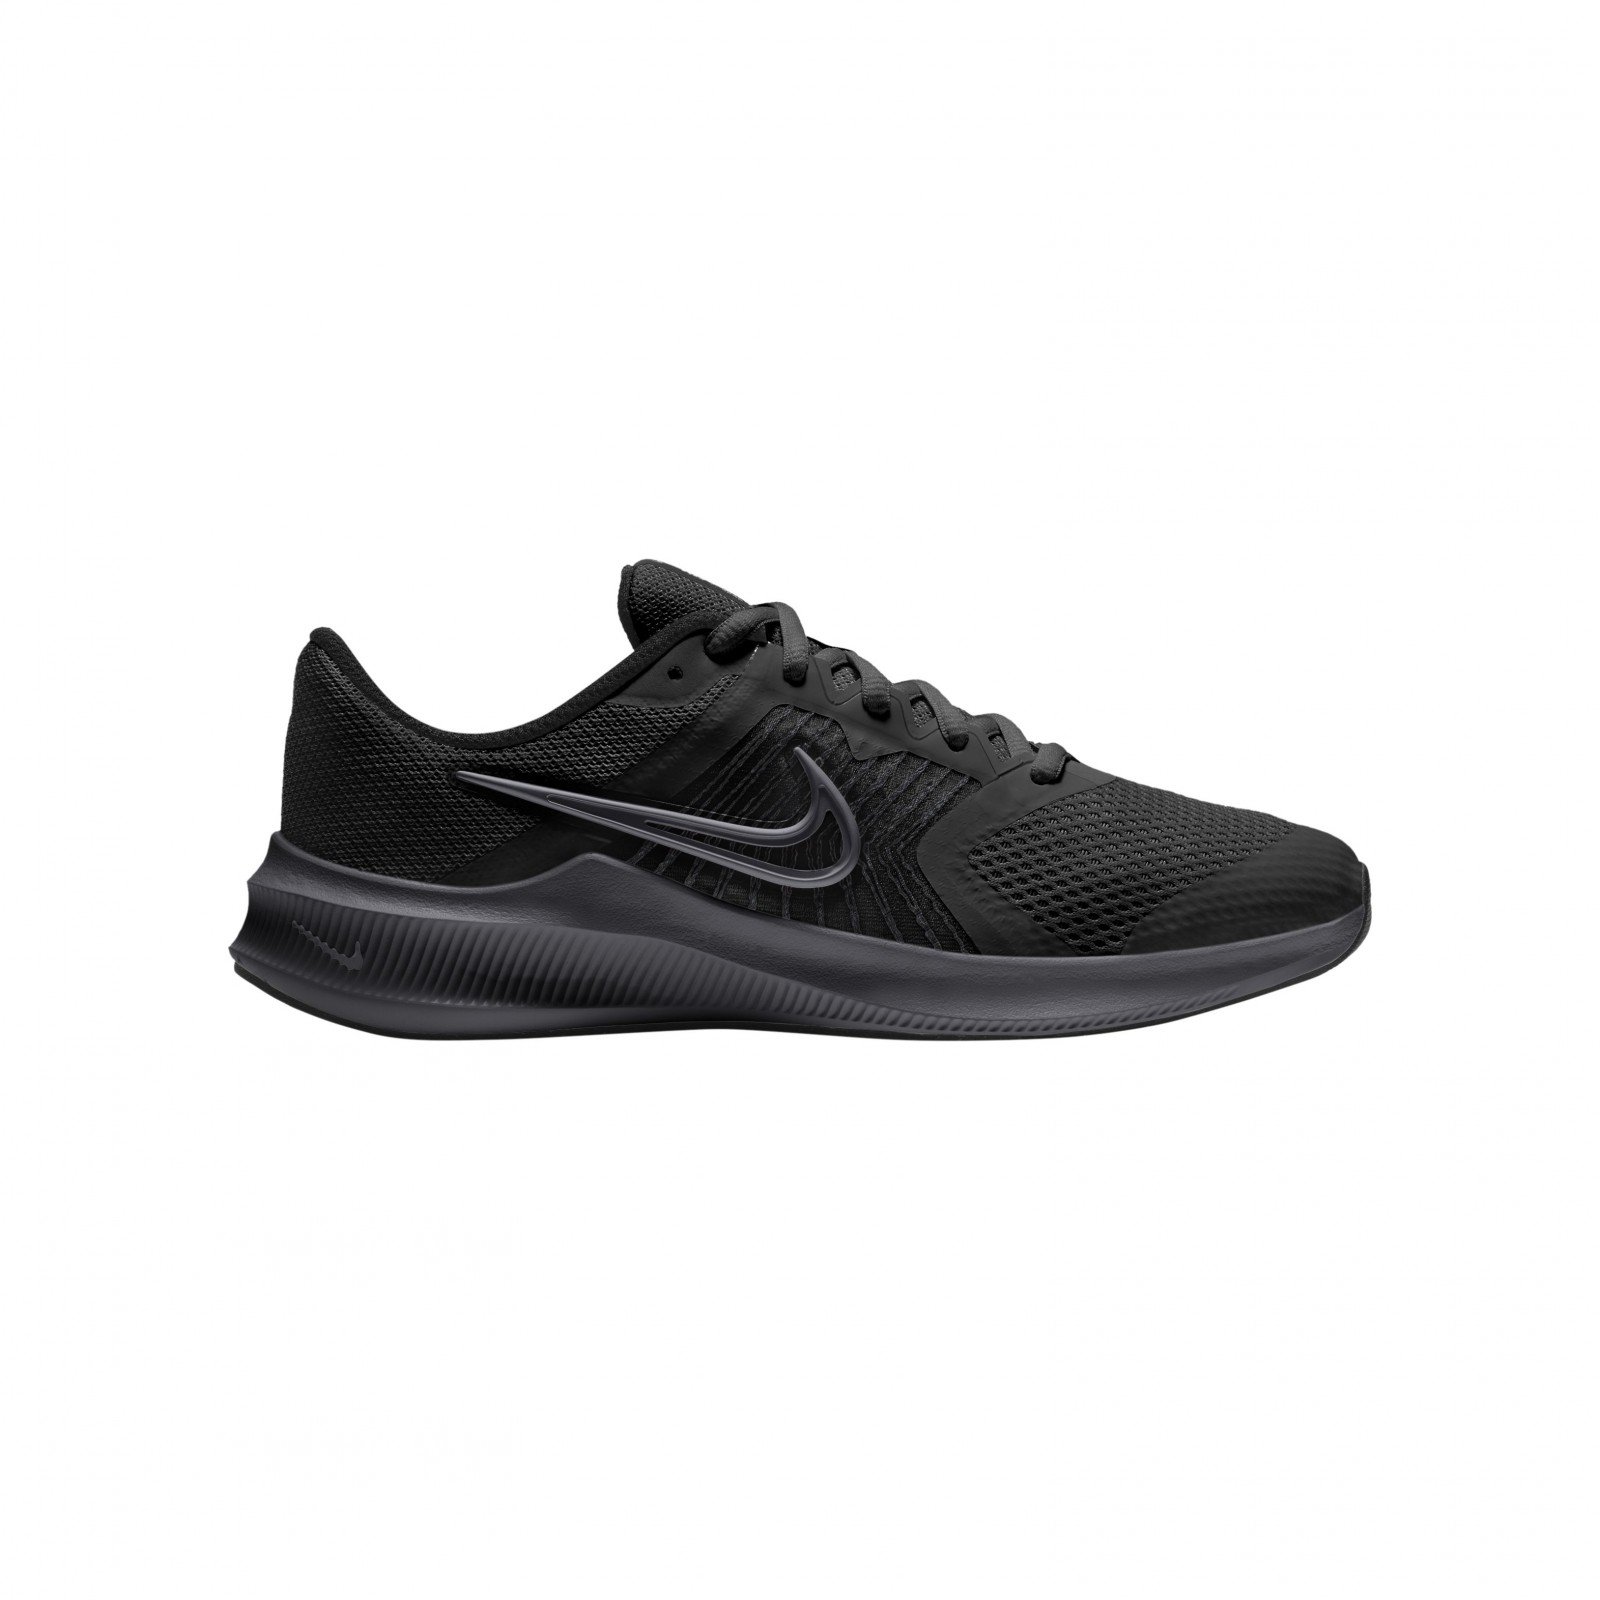 Nike Downshifter 11 BLACK/DK SMOKE GREY